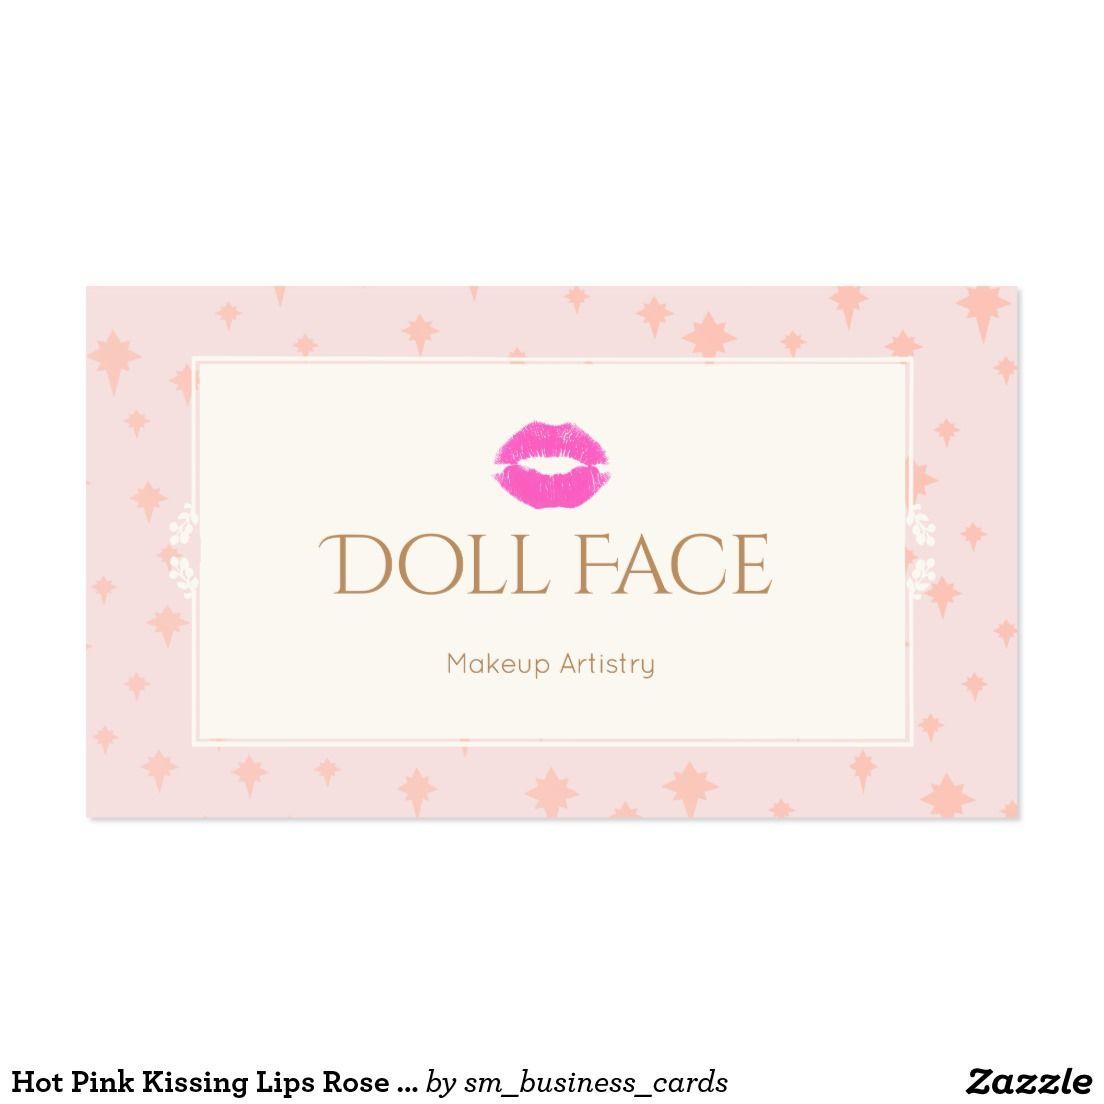 Cute Girly Hot Pink Kissing Lips Rose Makeup Artist Beauty ...